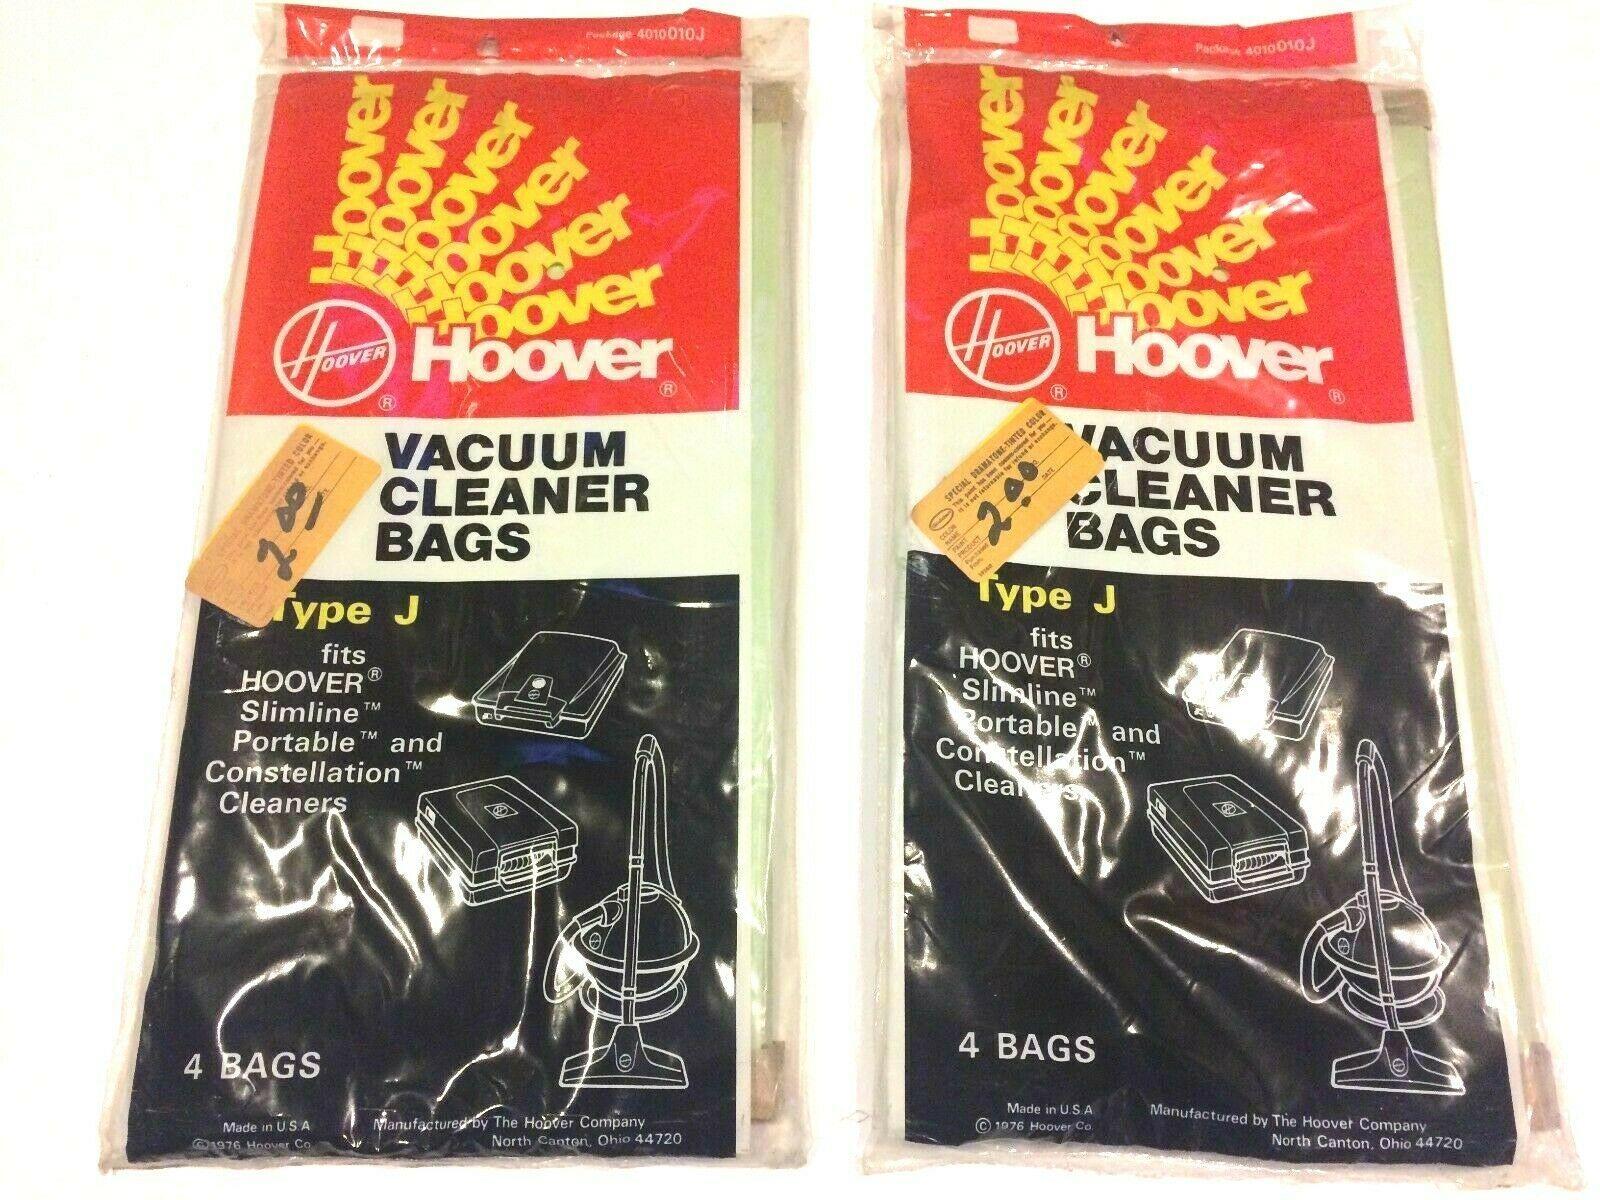 New Hoover Vacuum Cleaner Bags Type J Portable Slimline Constellation - 8 Bags